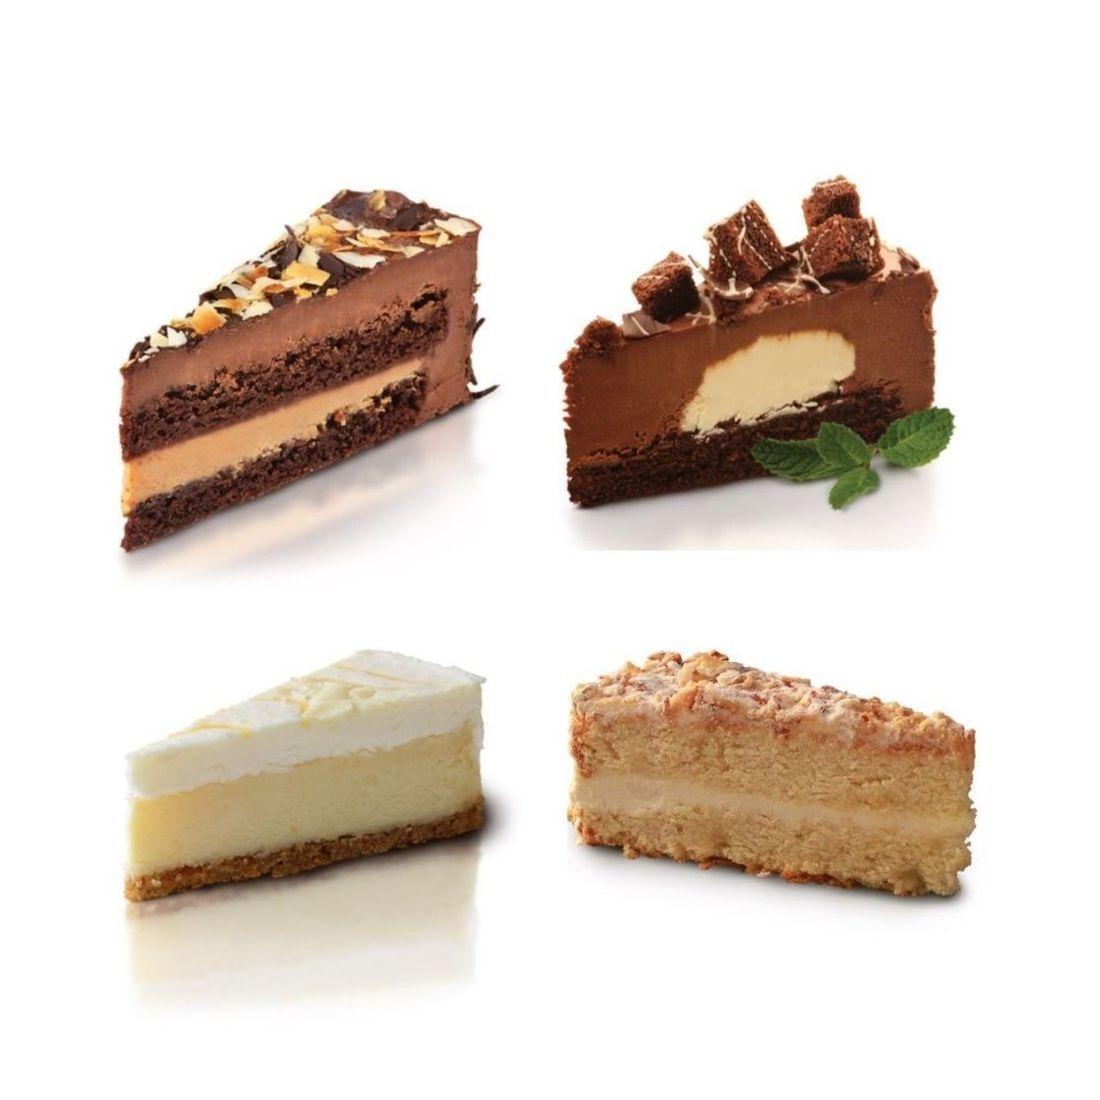 Gluten free dessert catering seattle